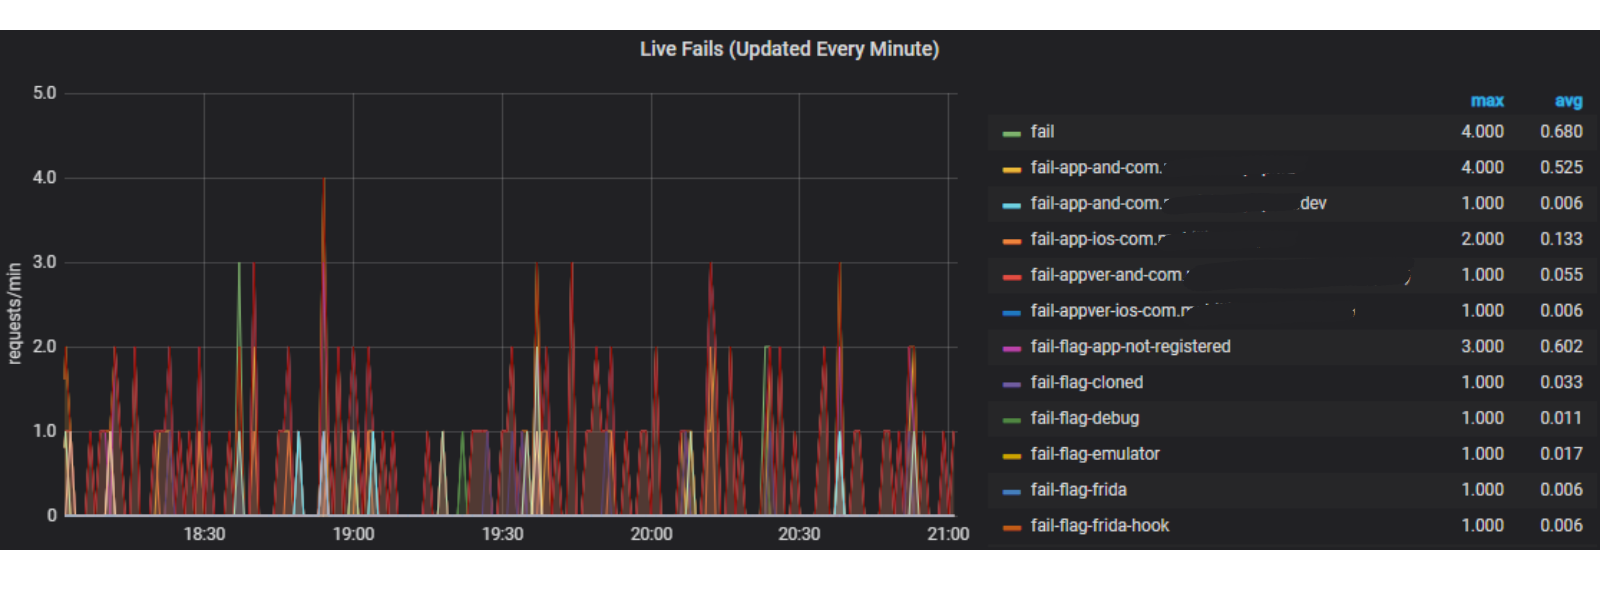 Screenshot of Approov customer metrics graph showing live fails